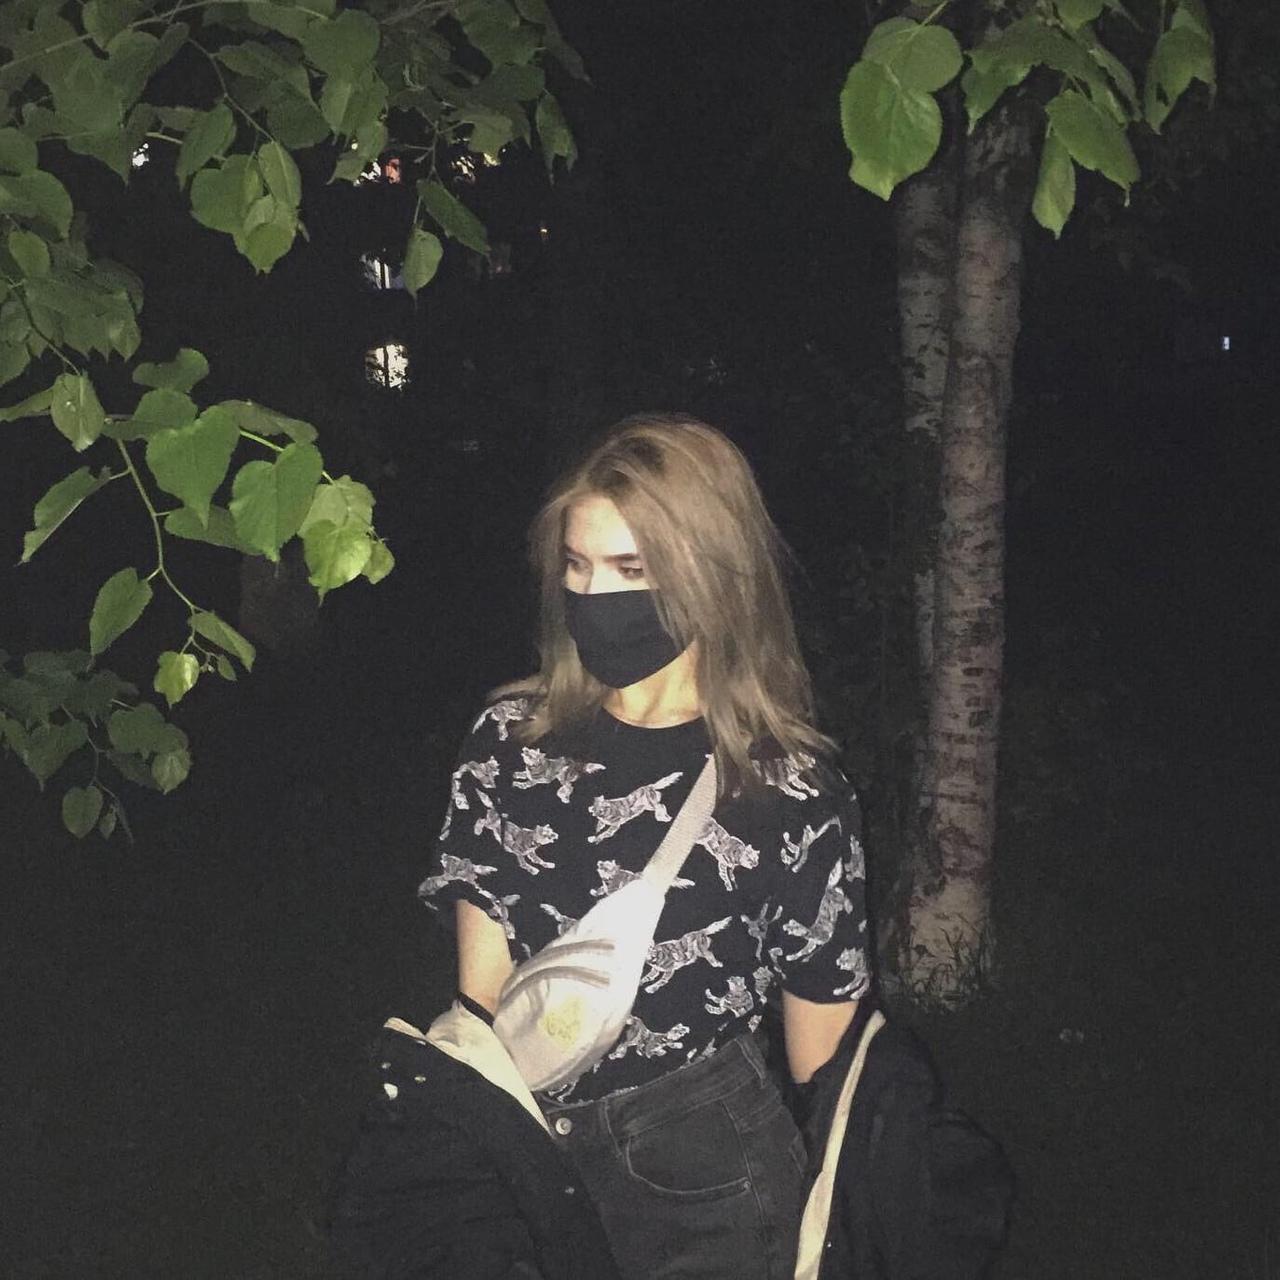 Анастасия Кафельникова - фото №3